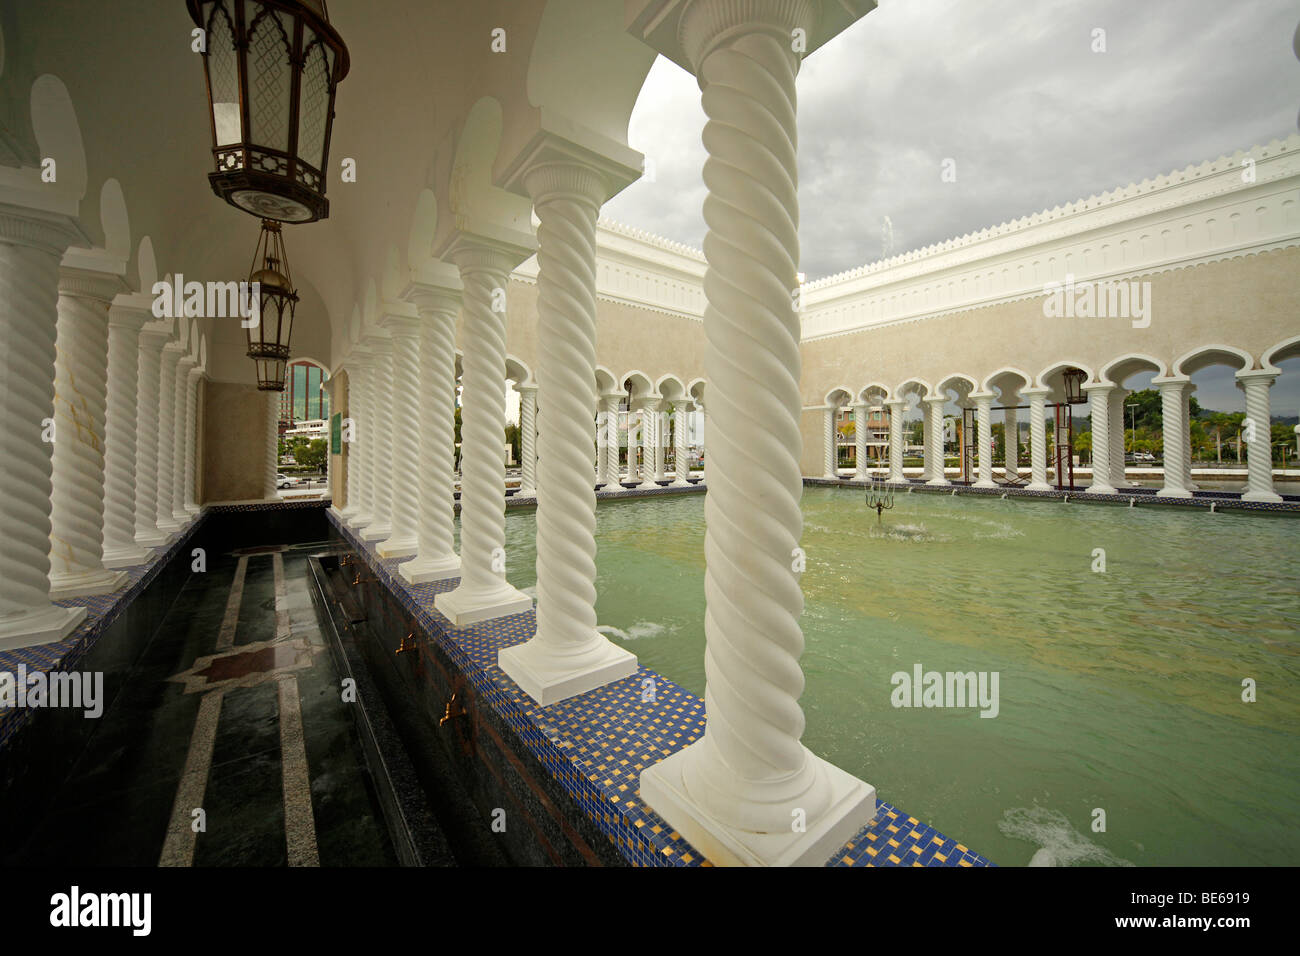 Fountain and pillars in the Royal Mosque of Sultan Omar Ali Saifuddin in Bandar Seri Begawan, Brunei, Asia - Stock Image